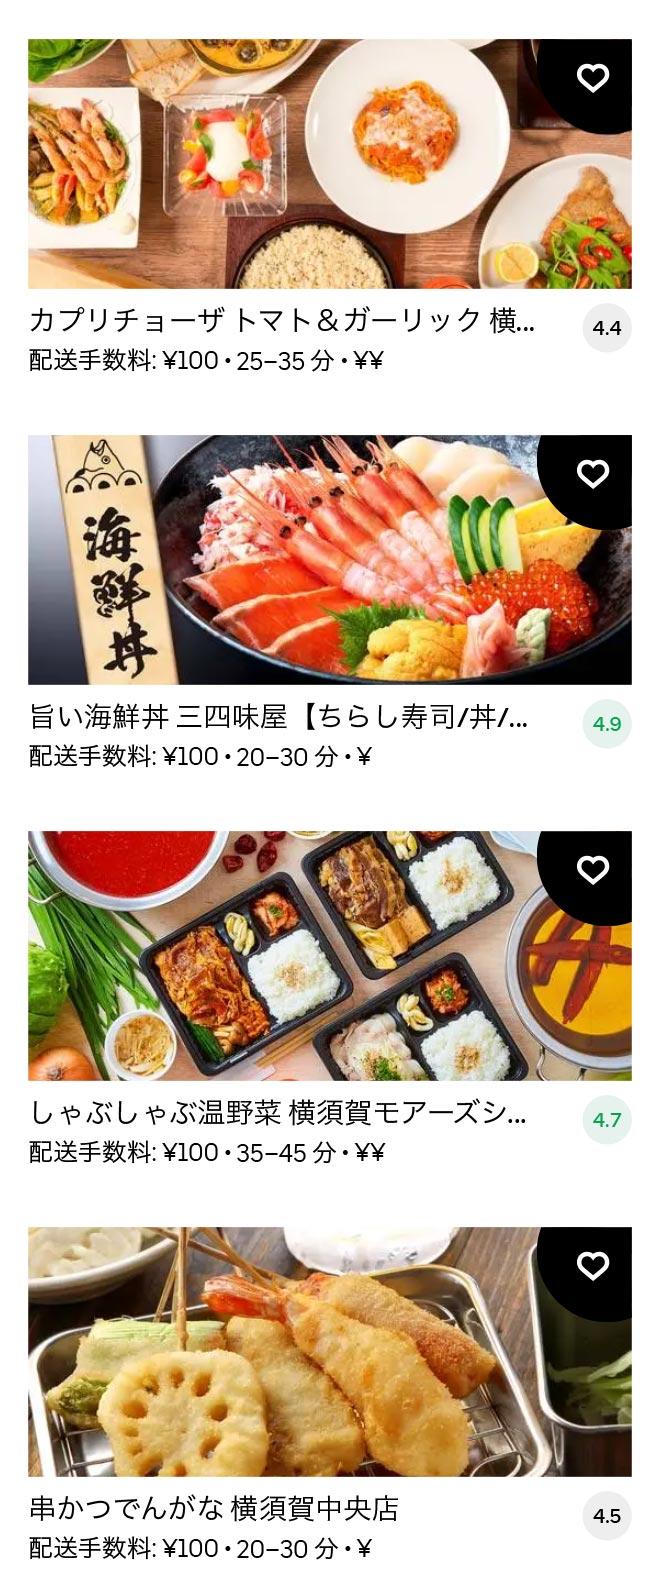 Yokosuka chuo menu 2011 10